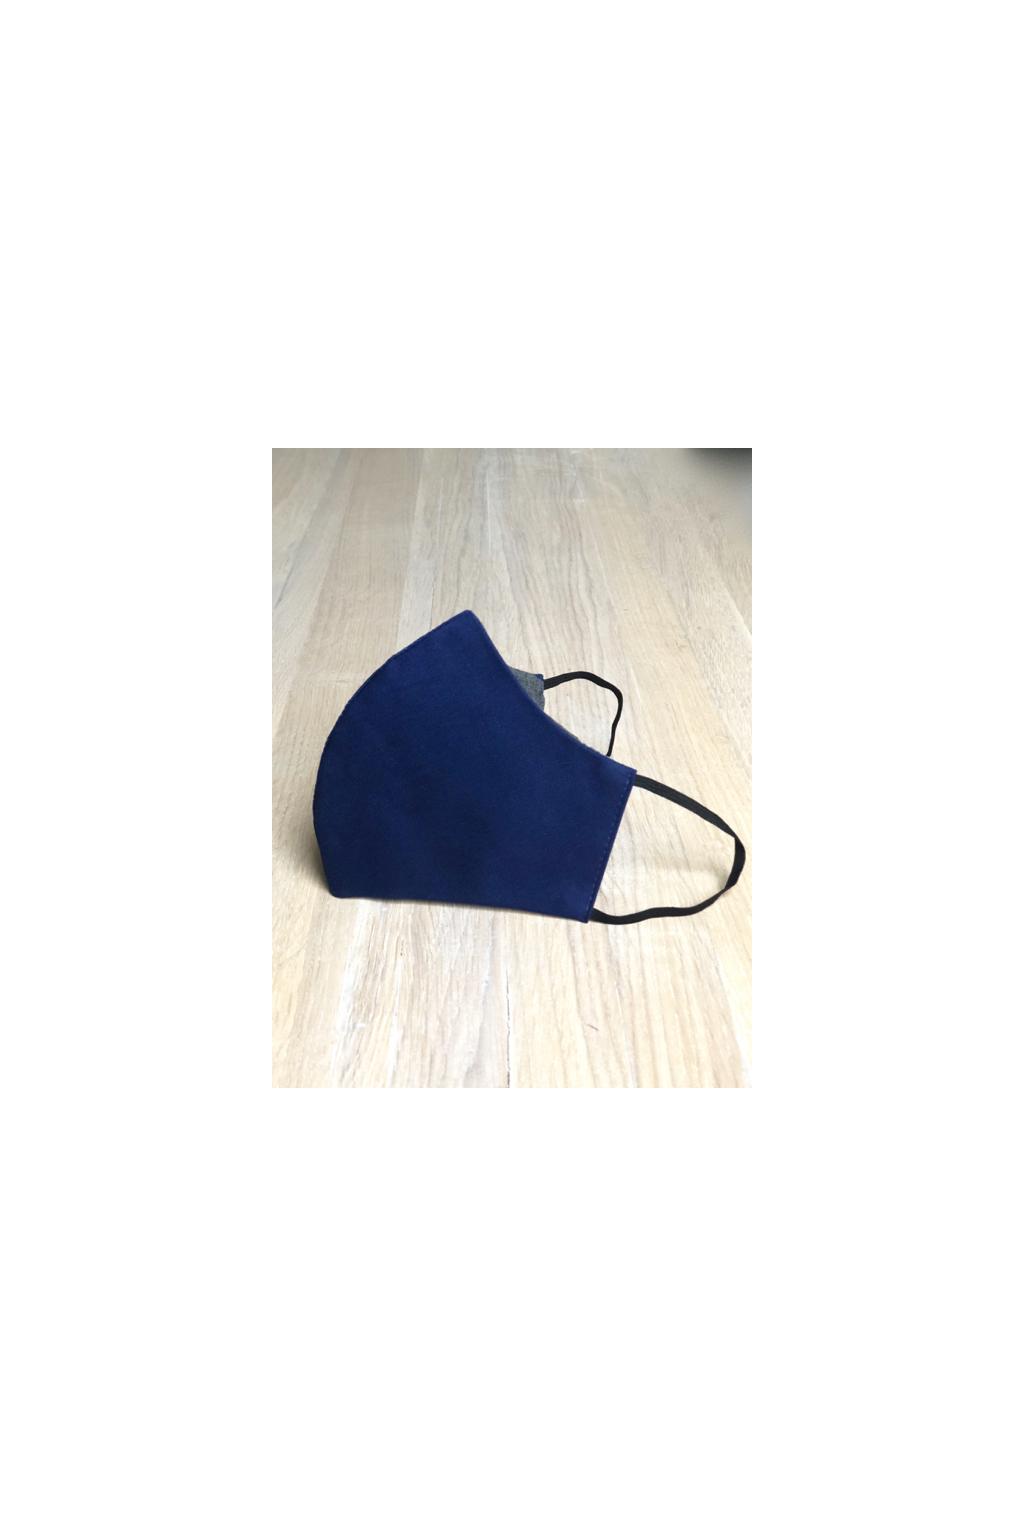 Pánská jednobarevná rouška - modrá